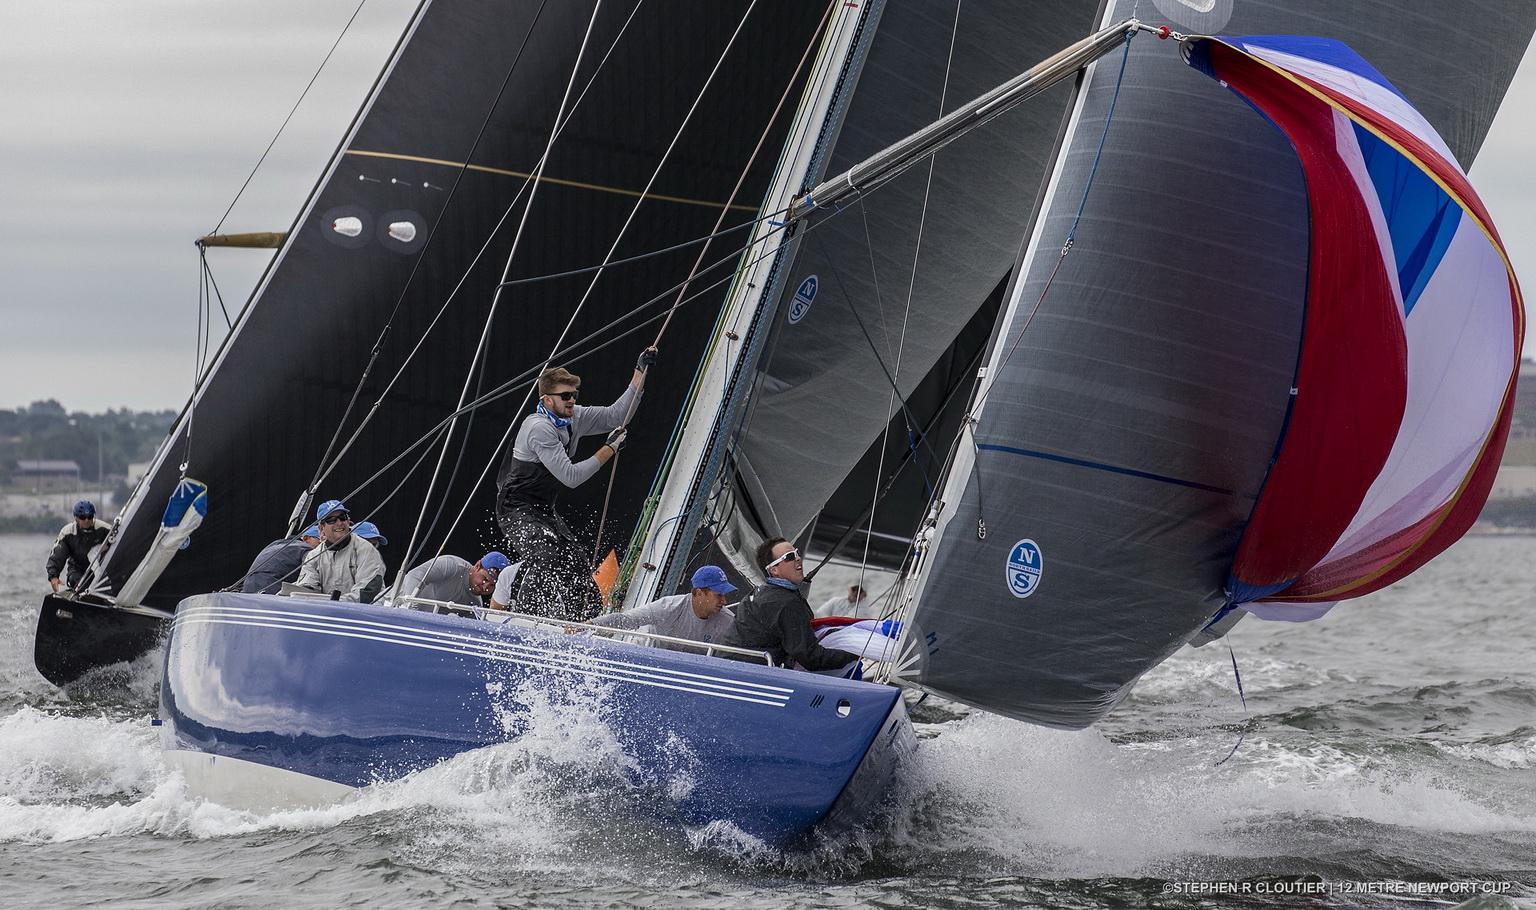 12 Metre World Championship Returns to Newport, Rhode Island in 2022